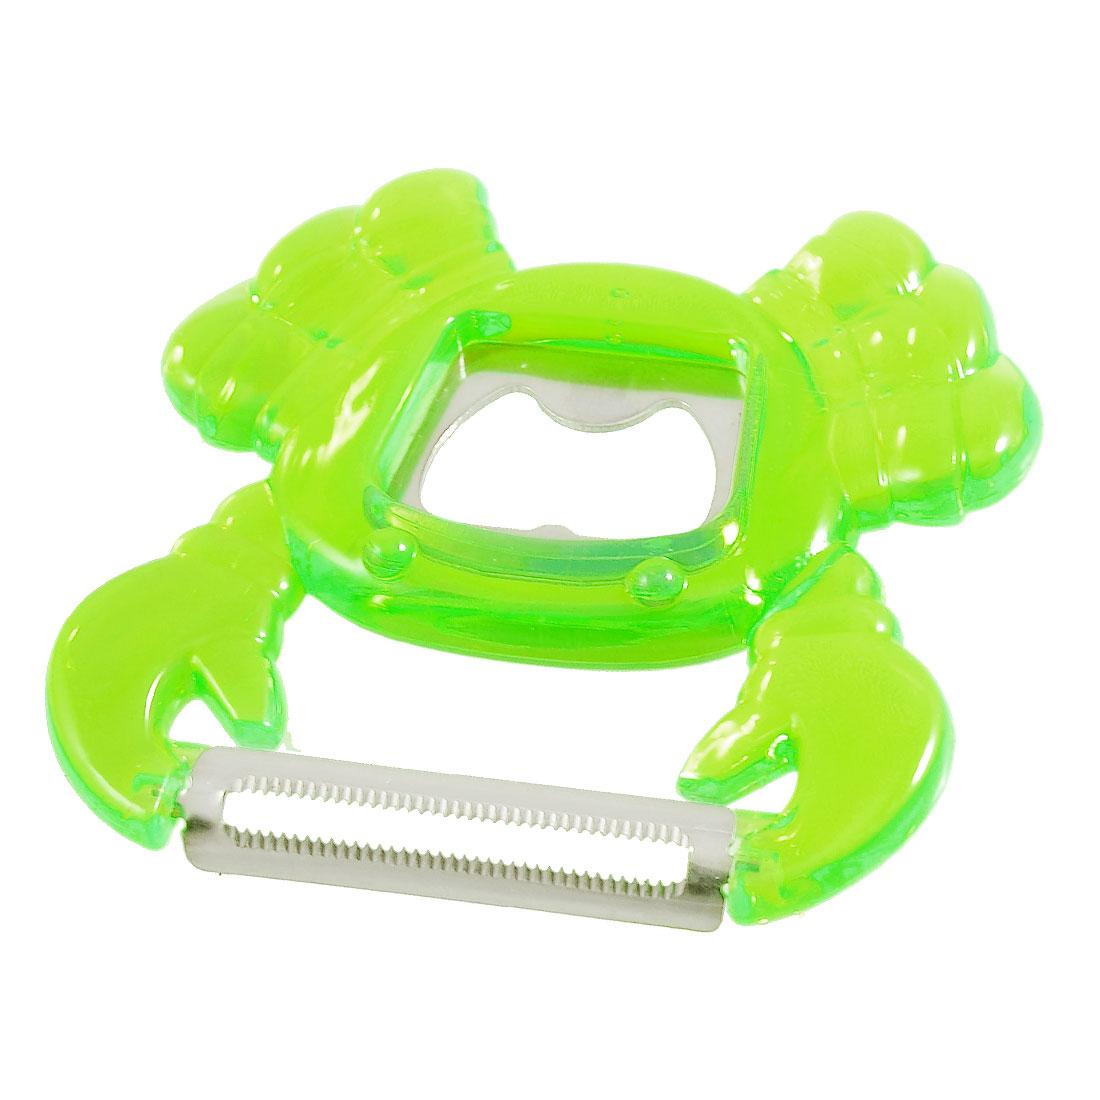 Green Plastic Crab Style Grip Vegetable Peeler Bottle Opener